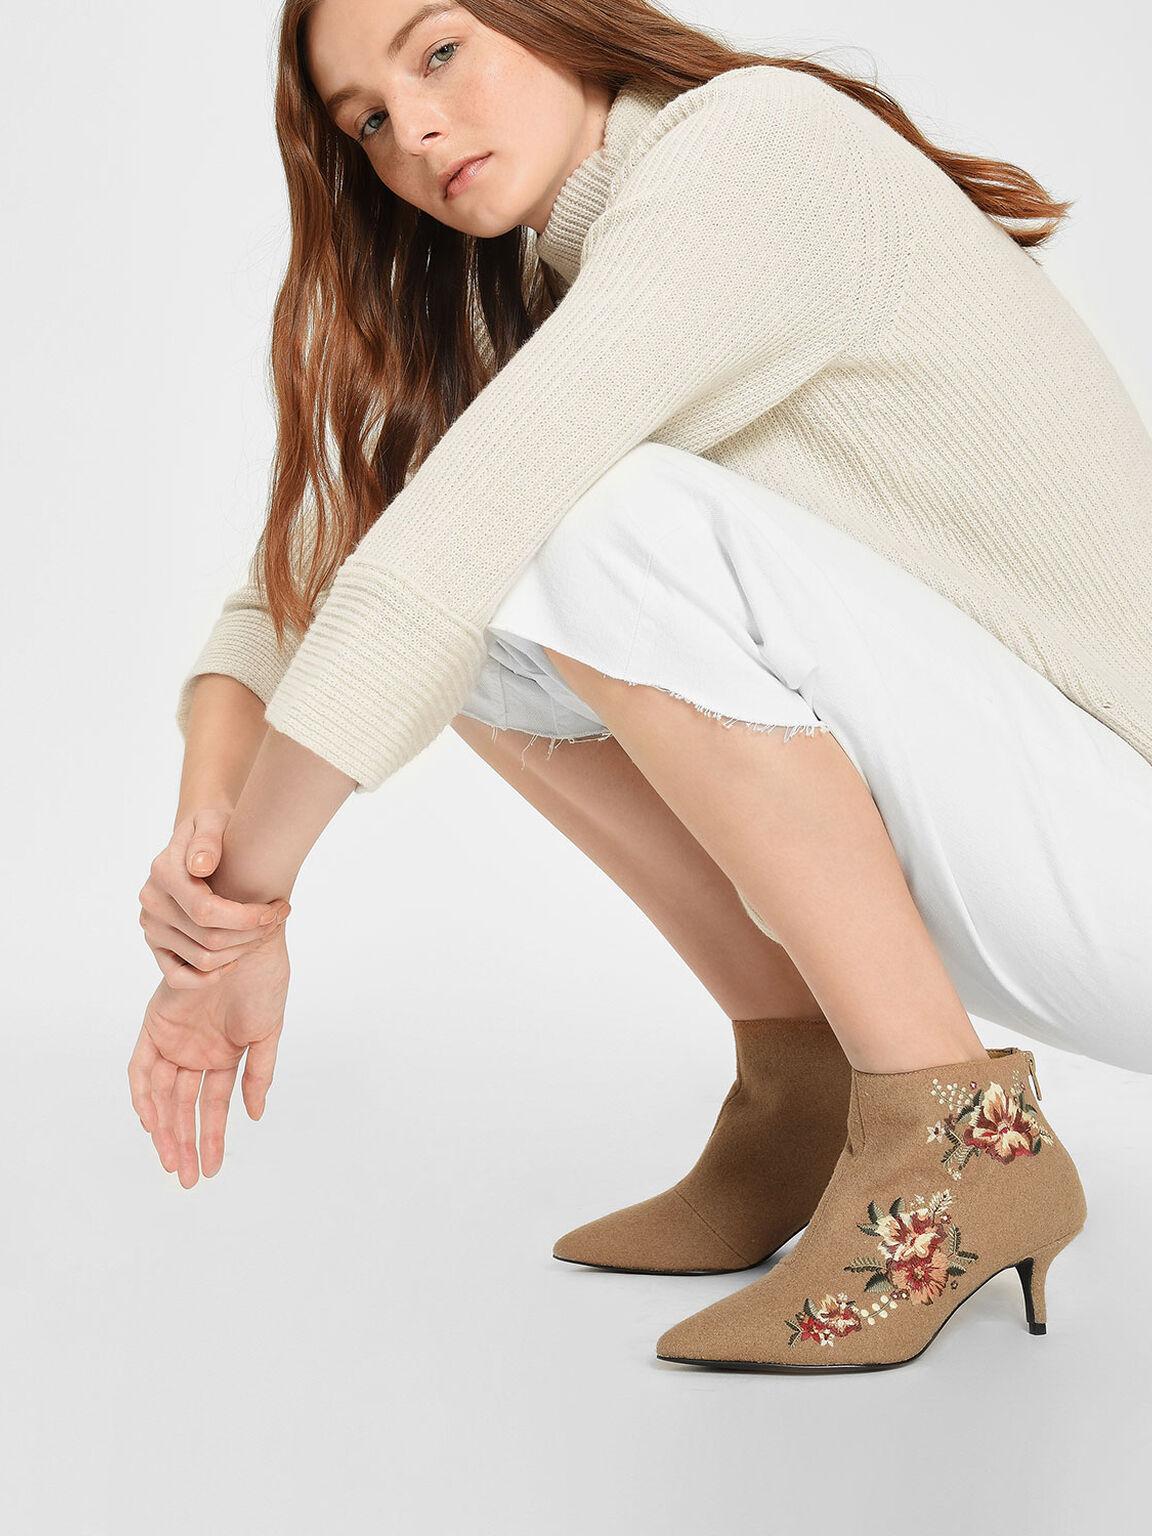 Floral Embroidery Kitten Heel Boots, Beige, hi-res